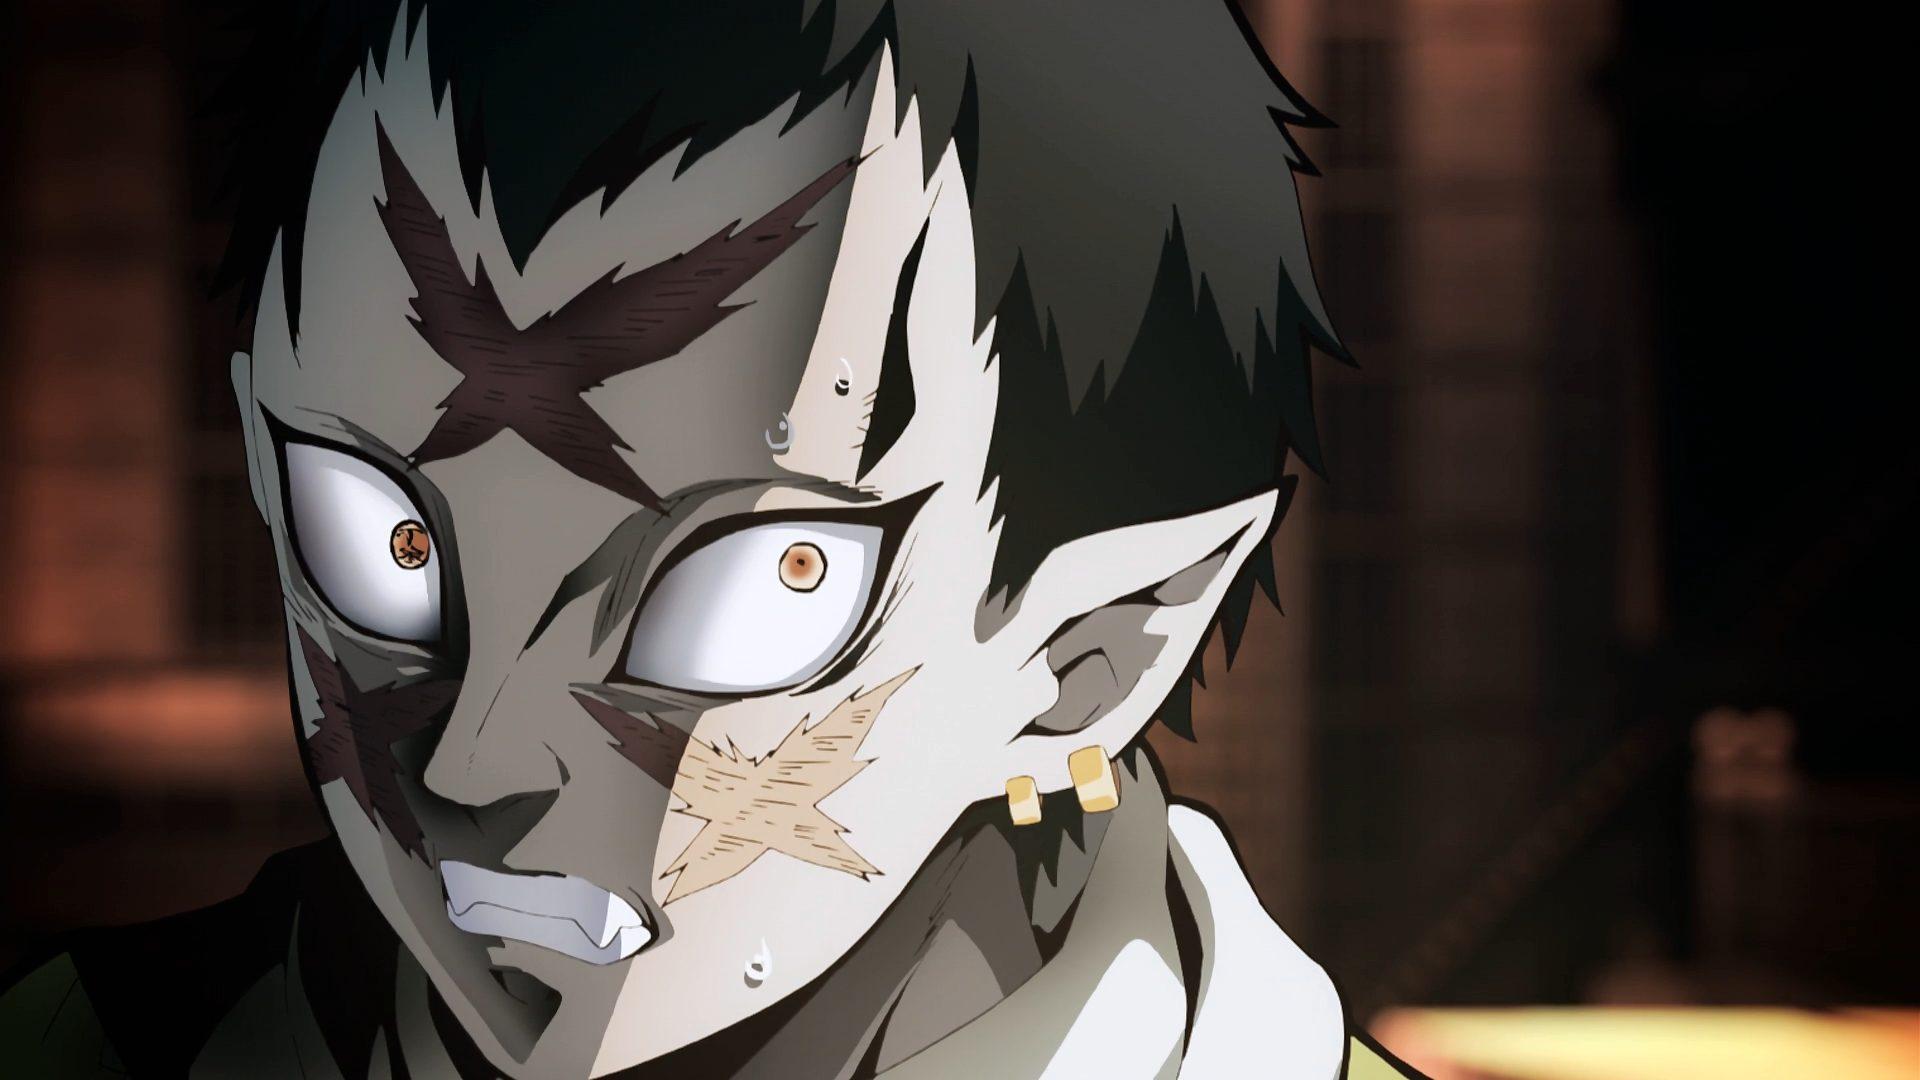 Daftar 6 Iblis Bulan Bawah Kimetsu no Yaiba 7